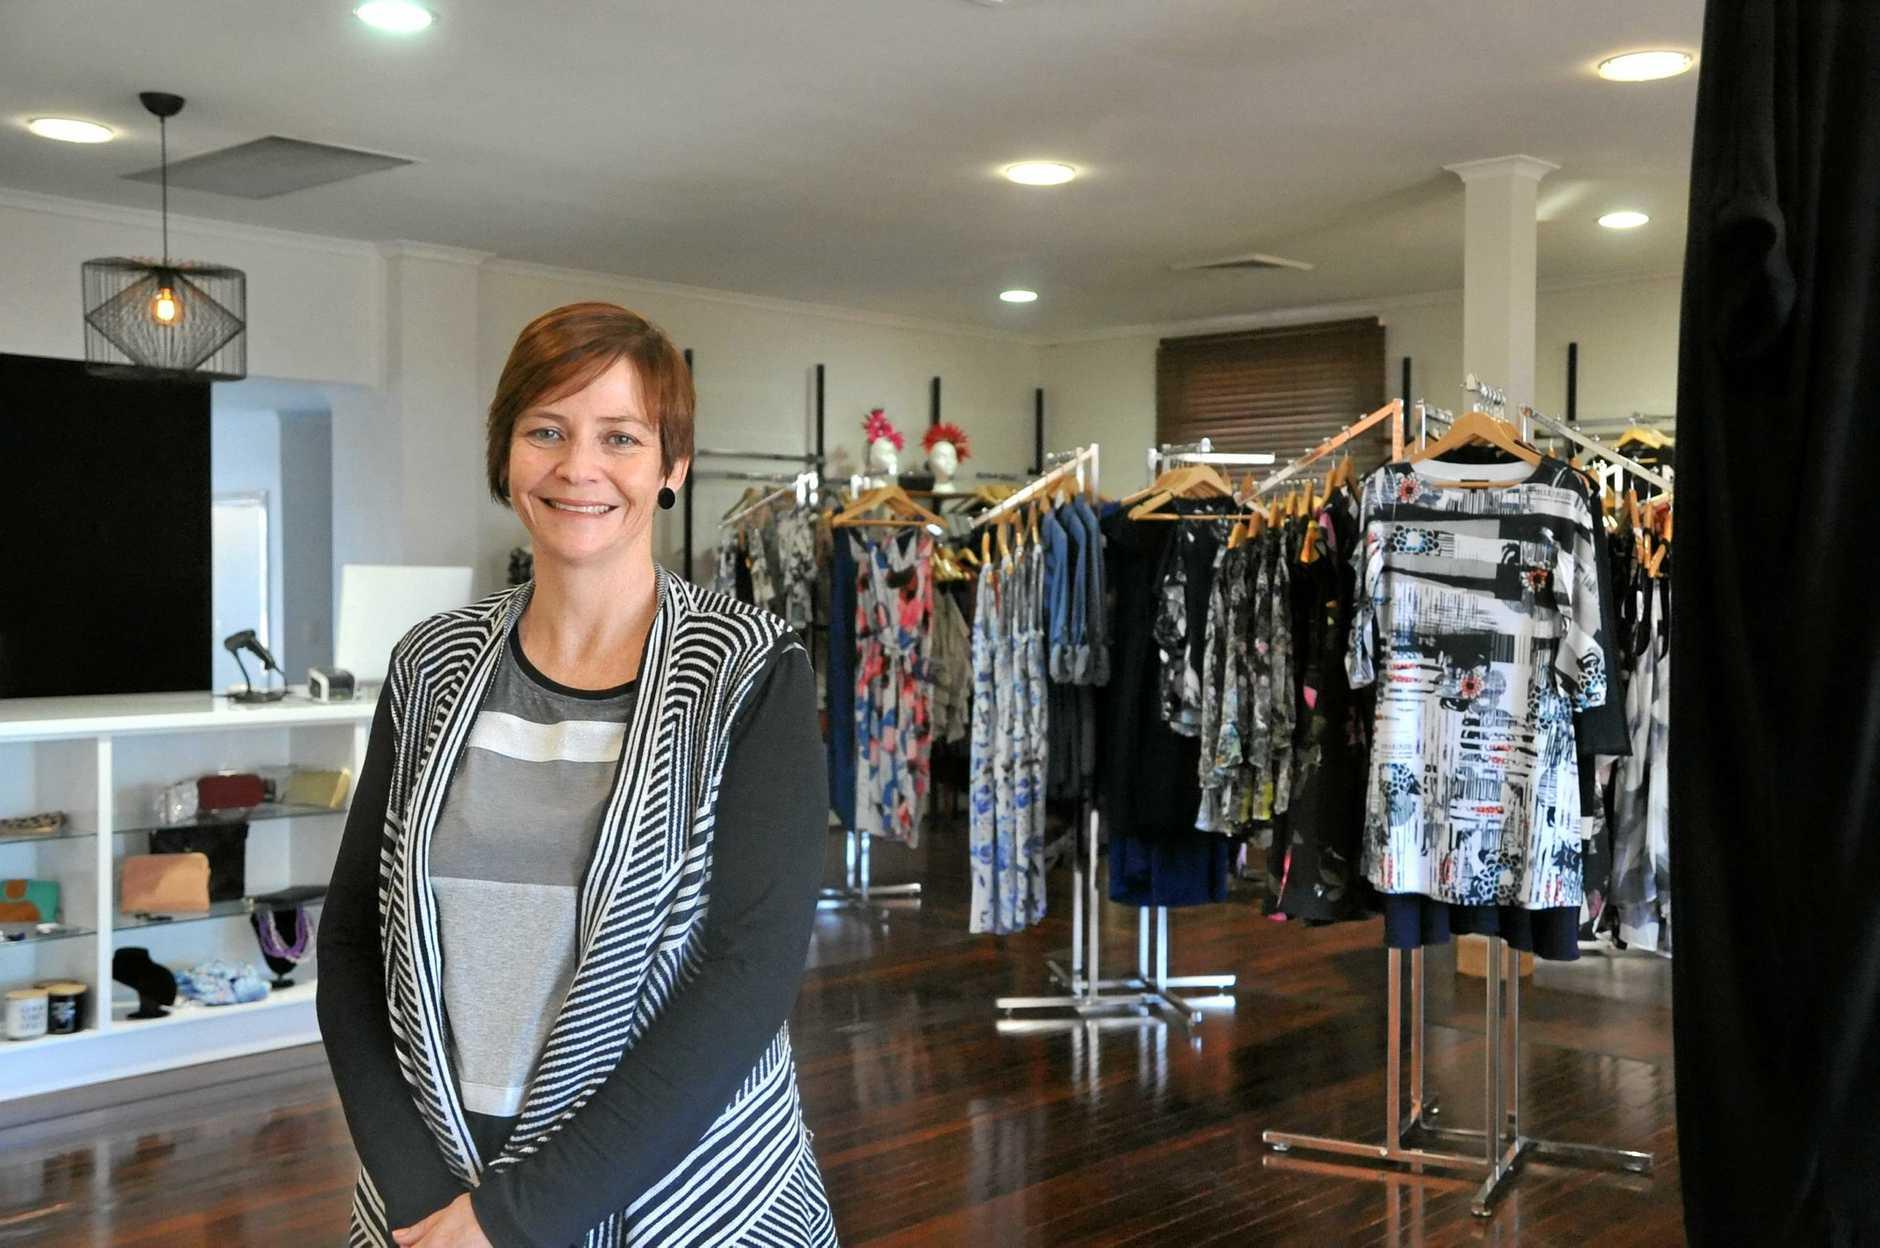 SMALL BUSINESS: Tania Hempseed opened the Hidden Wardrobe in Goondoon St in April.